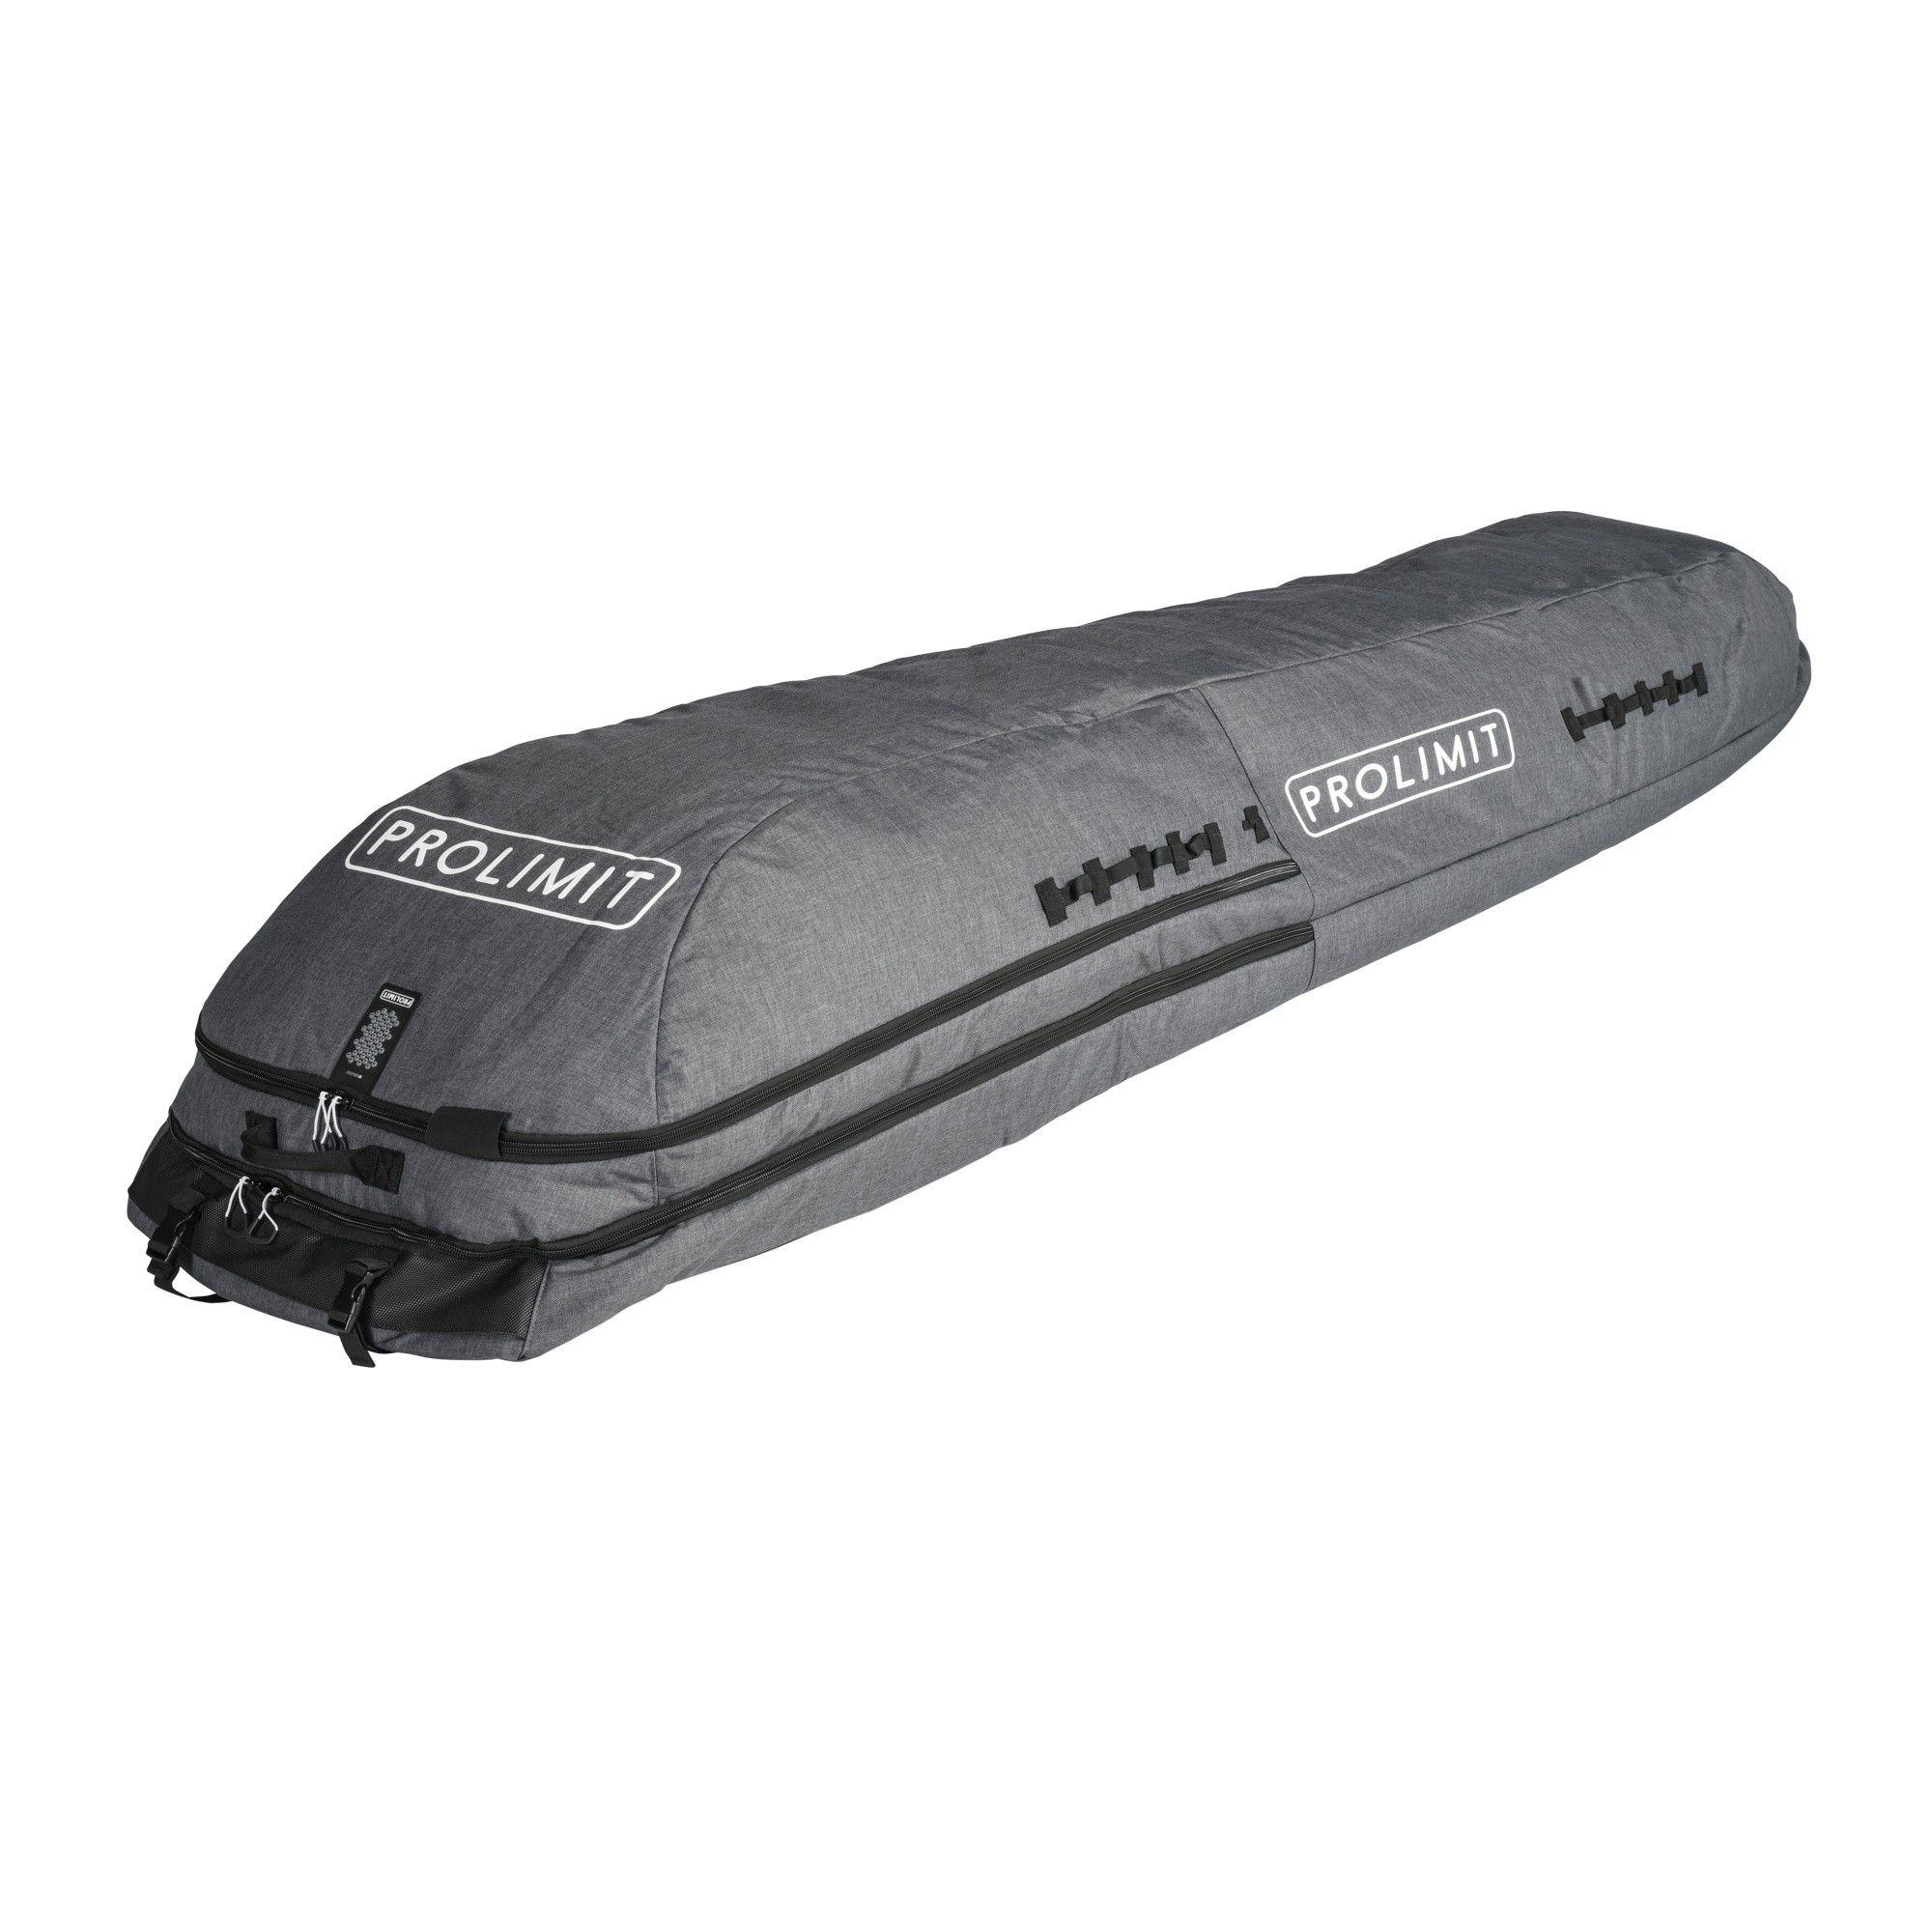 Prolimit Windsurf Boardbag Session